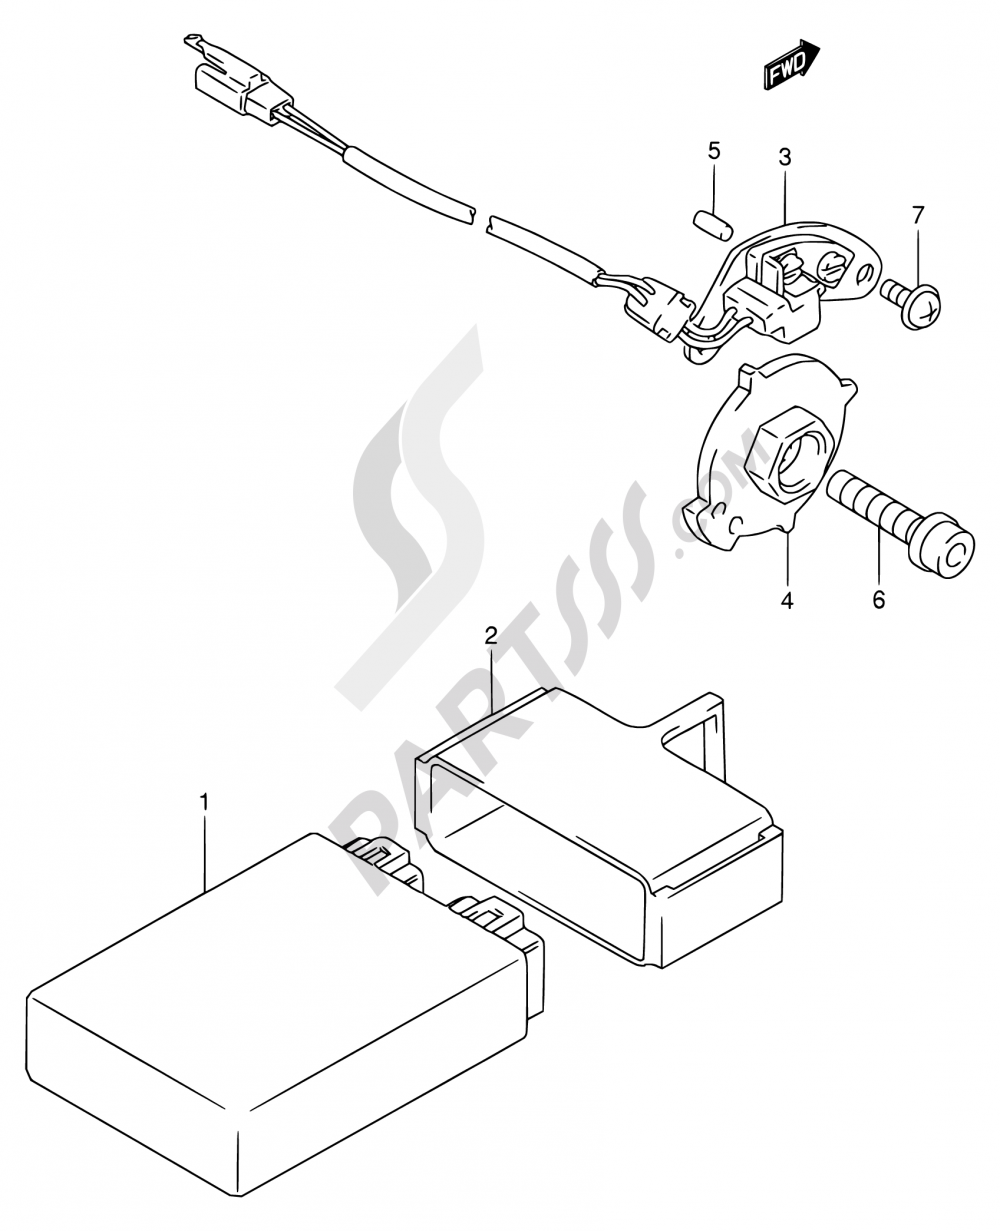 25 Signal Generator Model R S Suzuki Rf900r 1995 Wiring Diagram